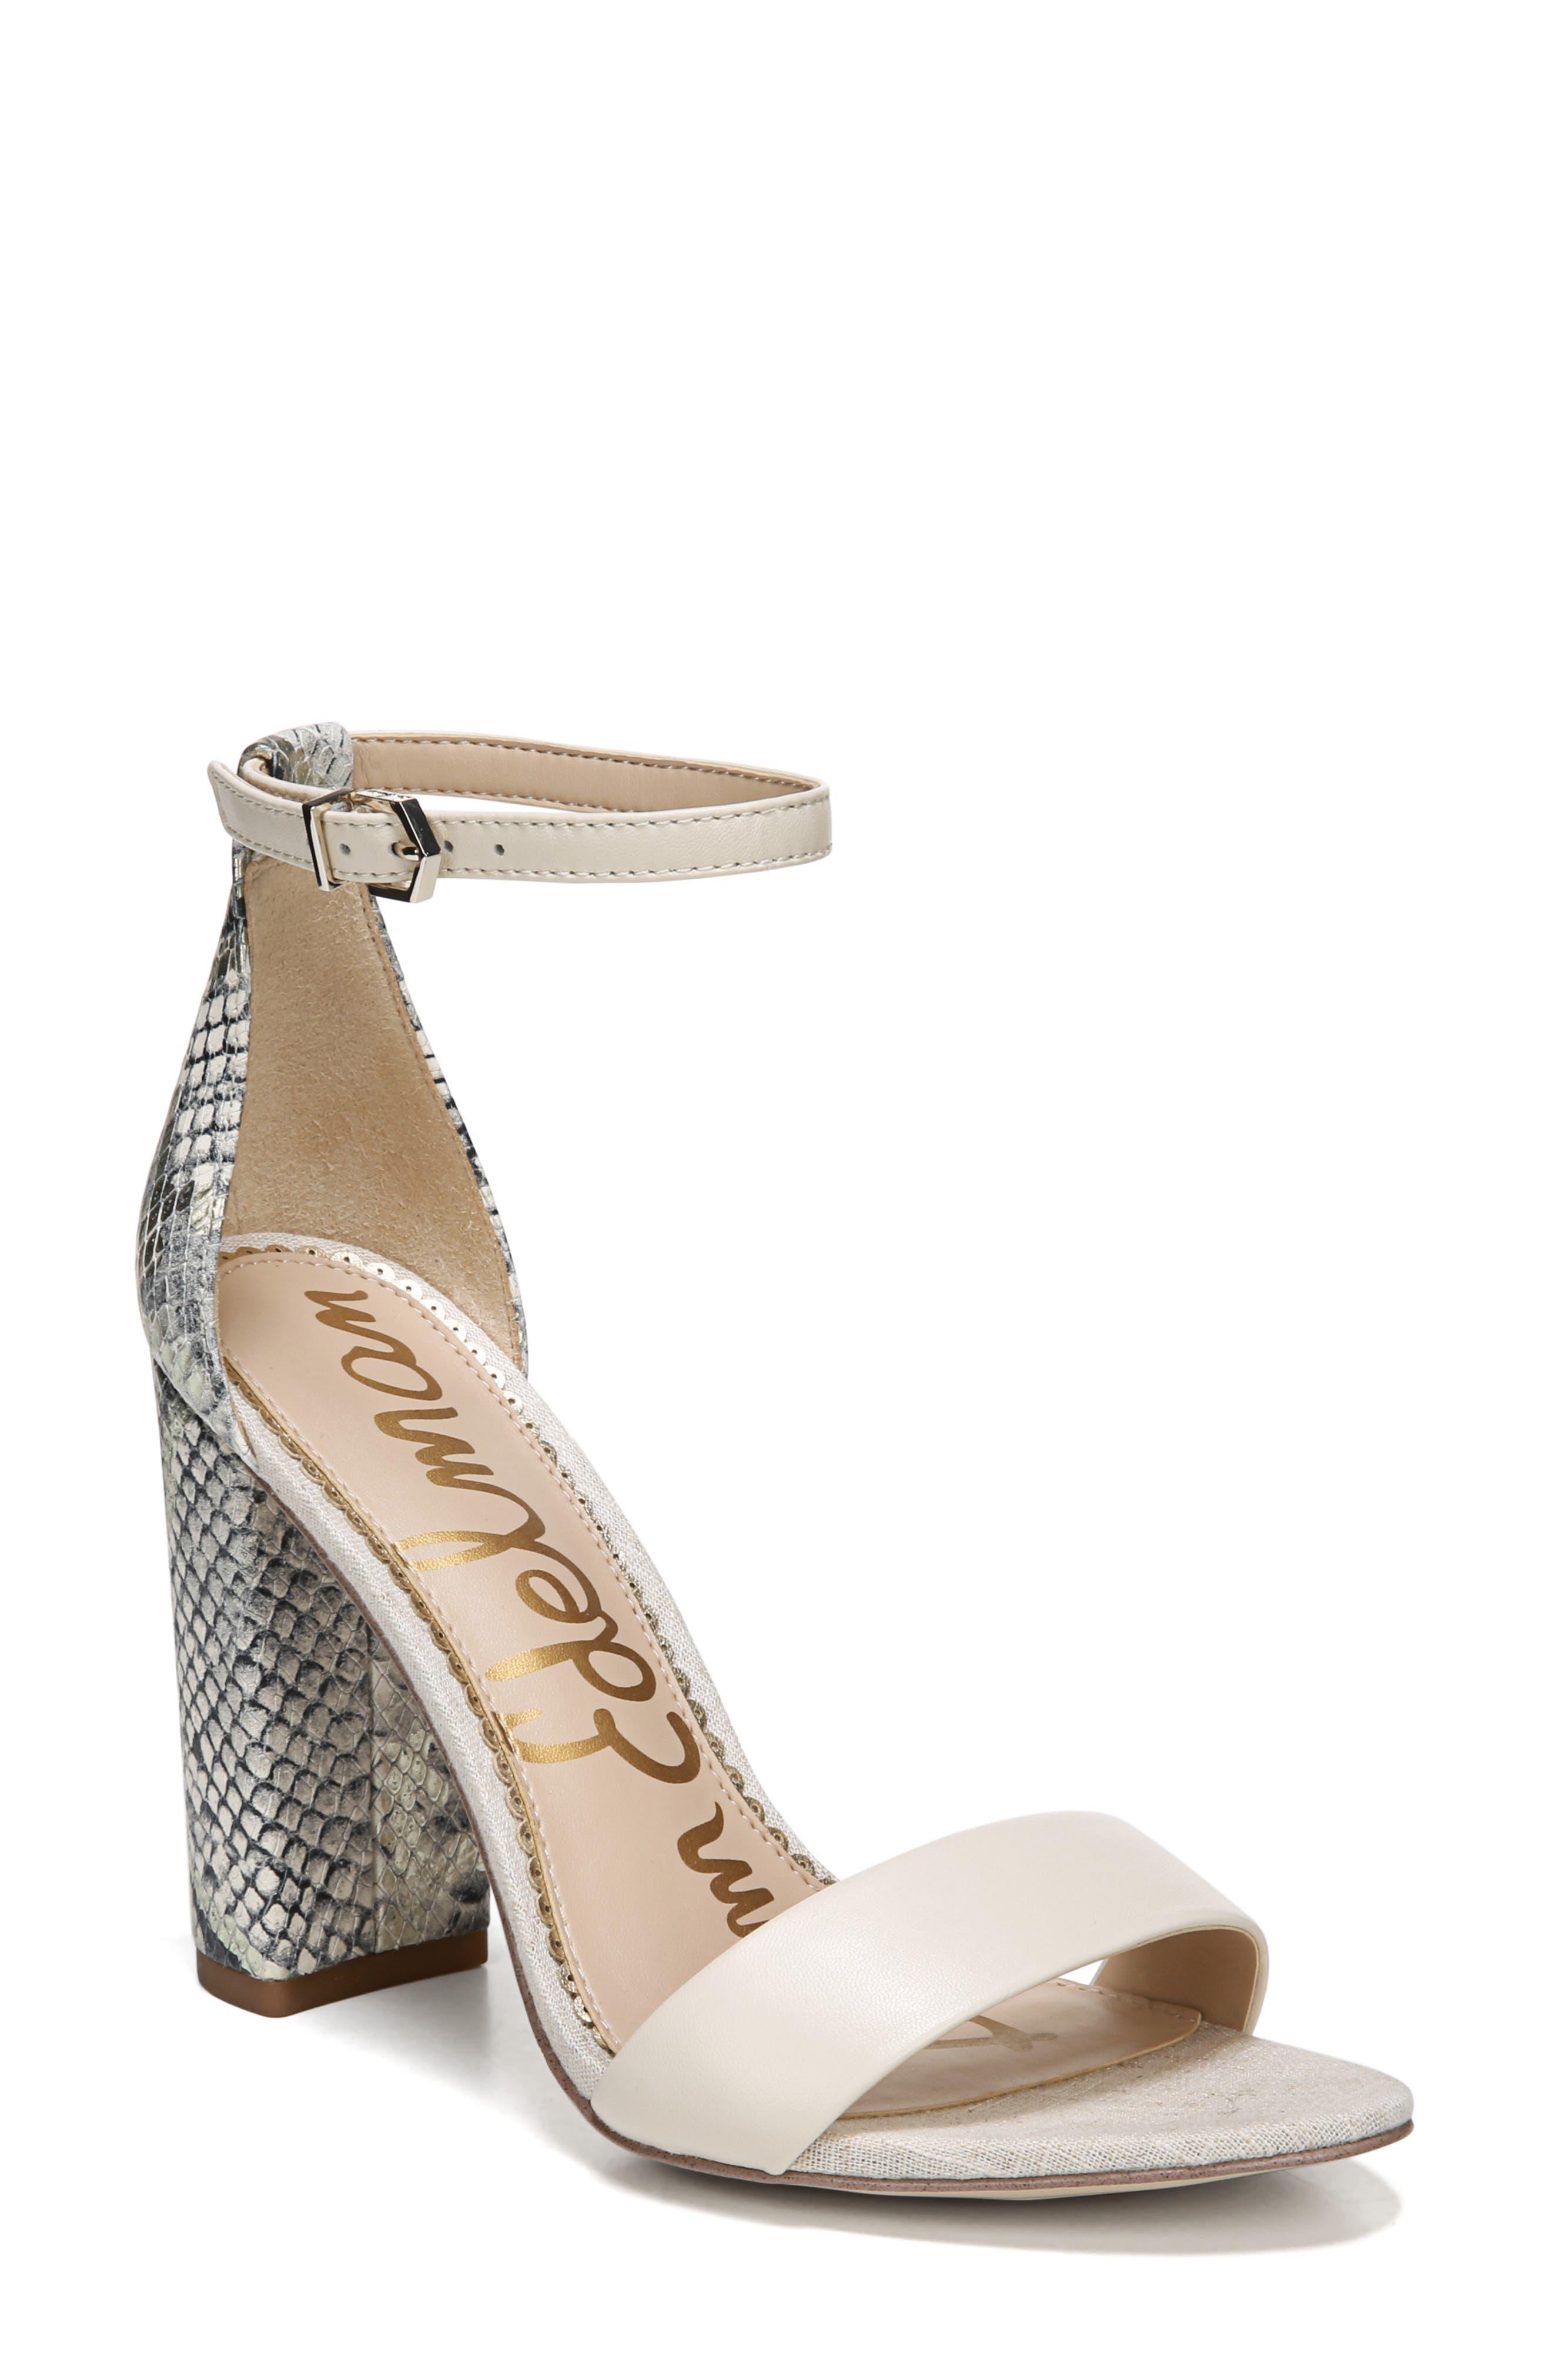 Sam Edelman Yaro Ankle Strap Sandal, Ivory